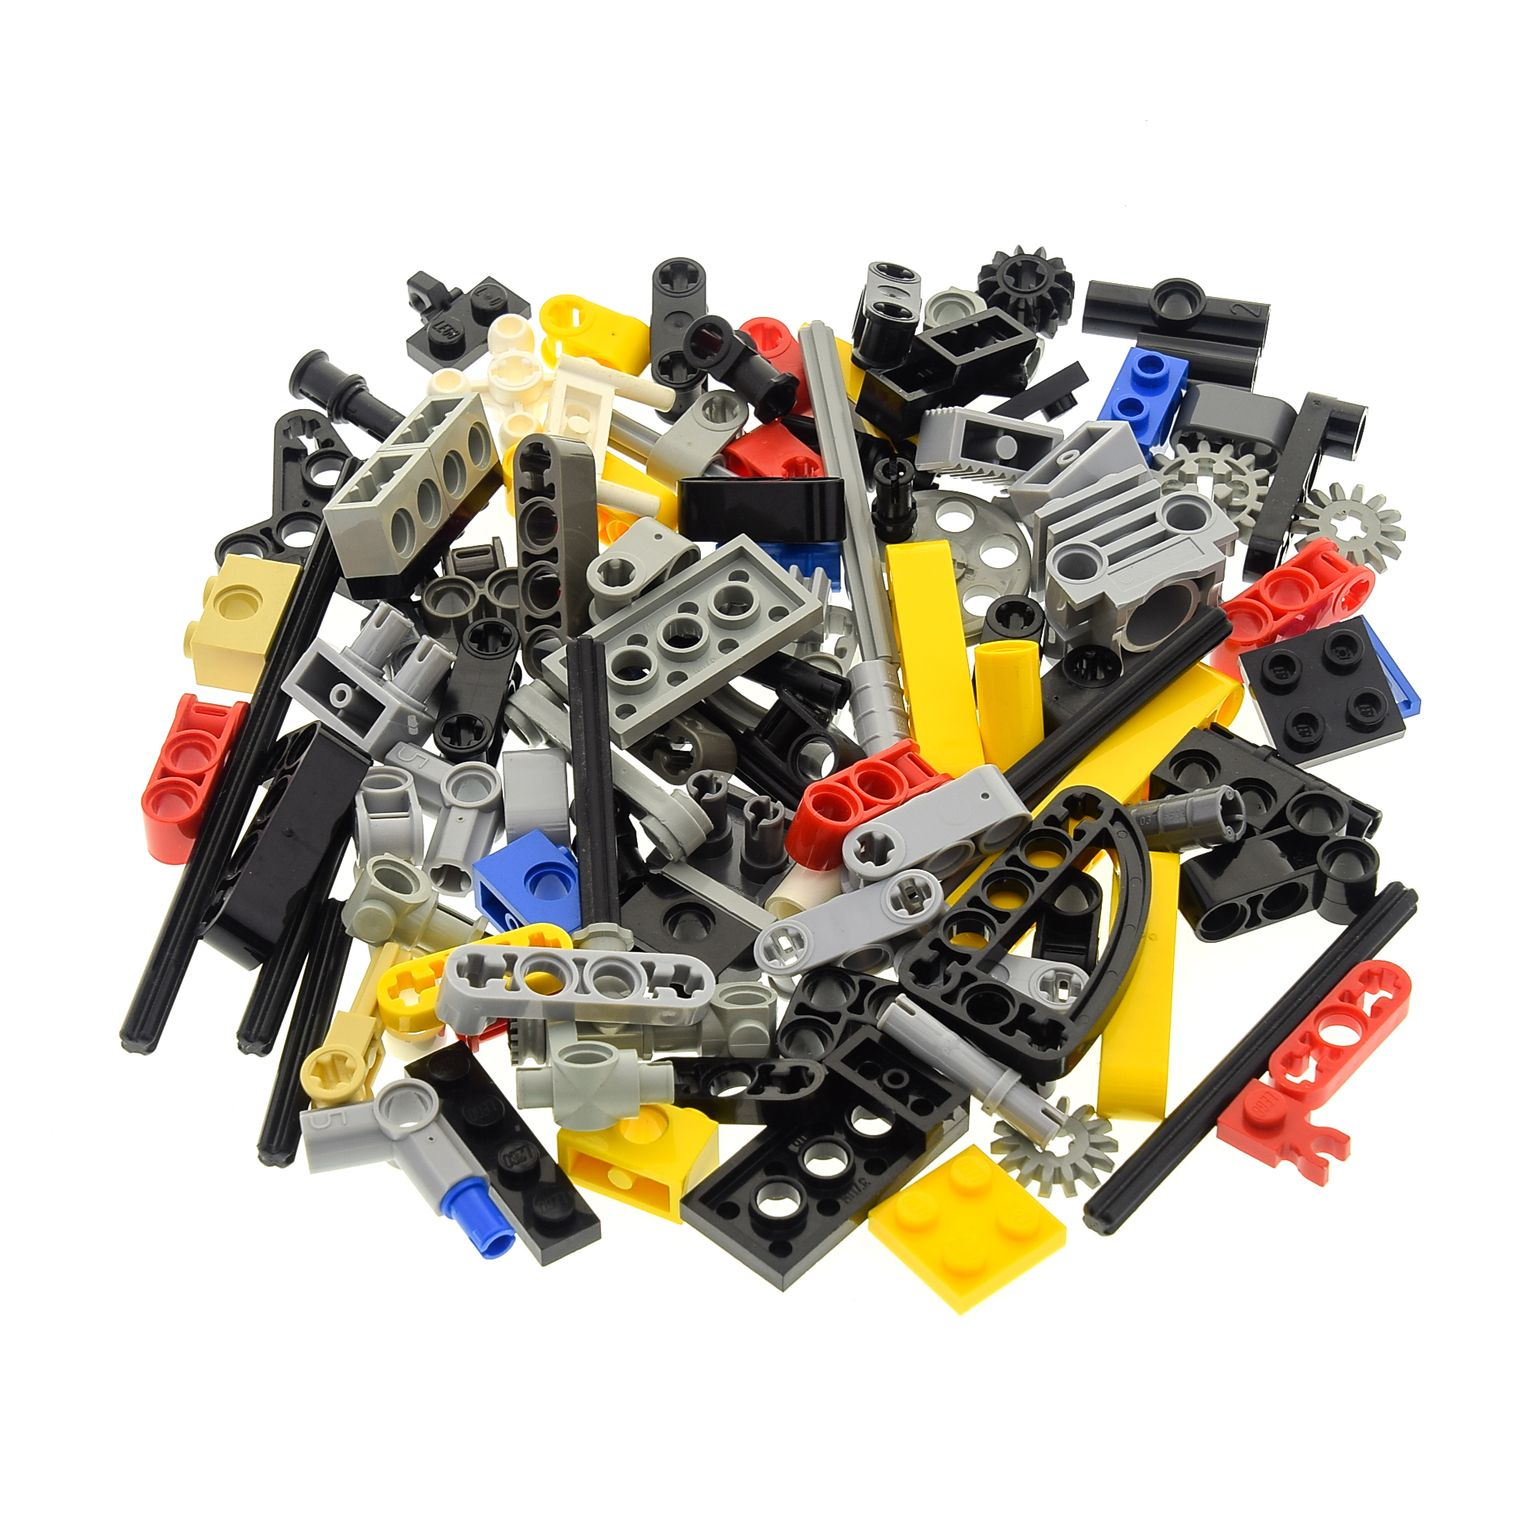 LEGO 1kilo Lego Technik Lochstangen  Konvolut Kiloware Spezialsteine  GEBRAUCHT